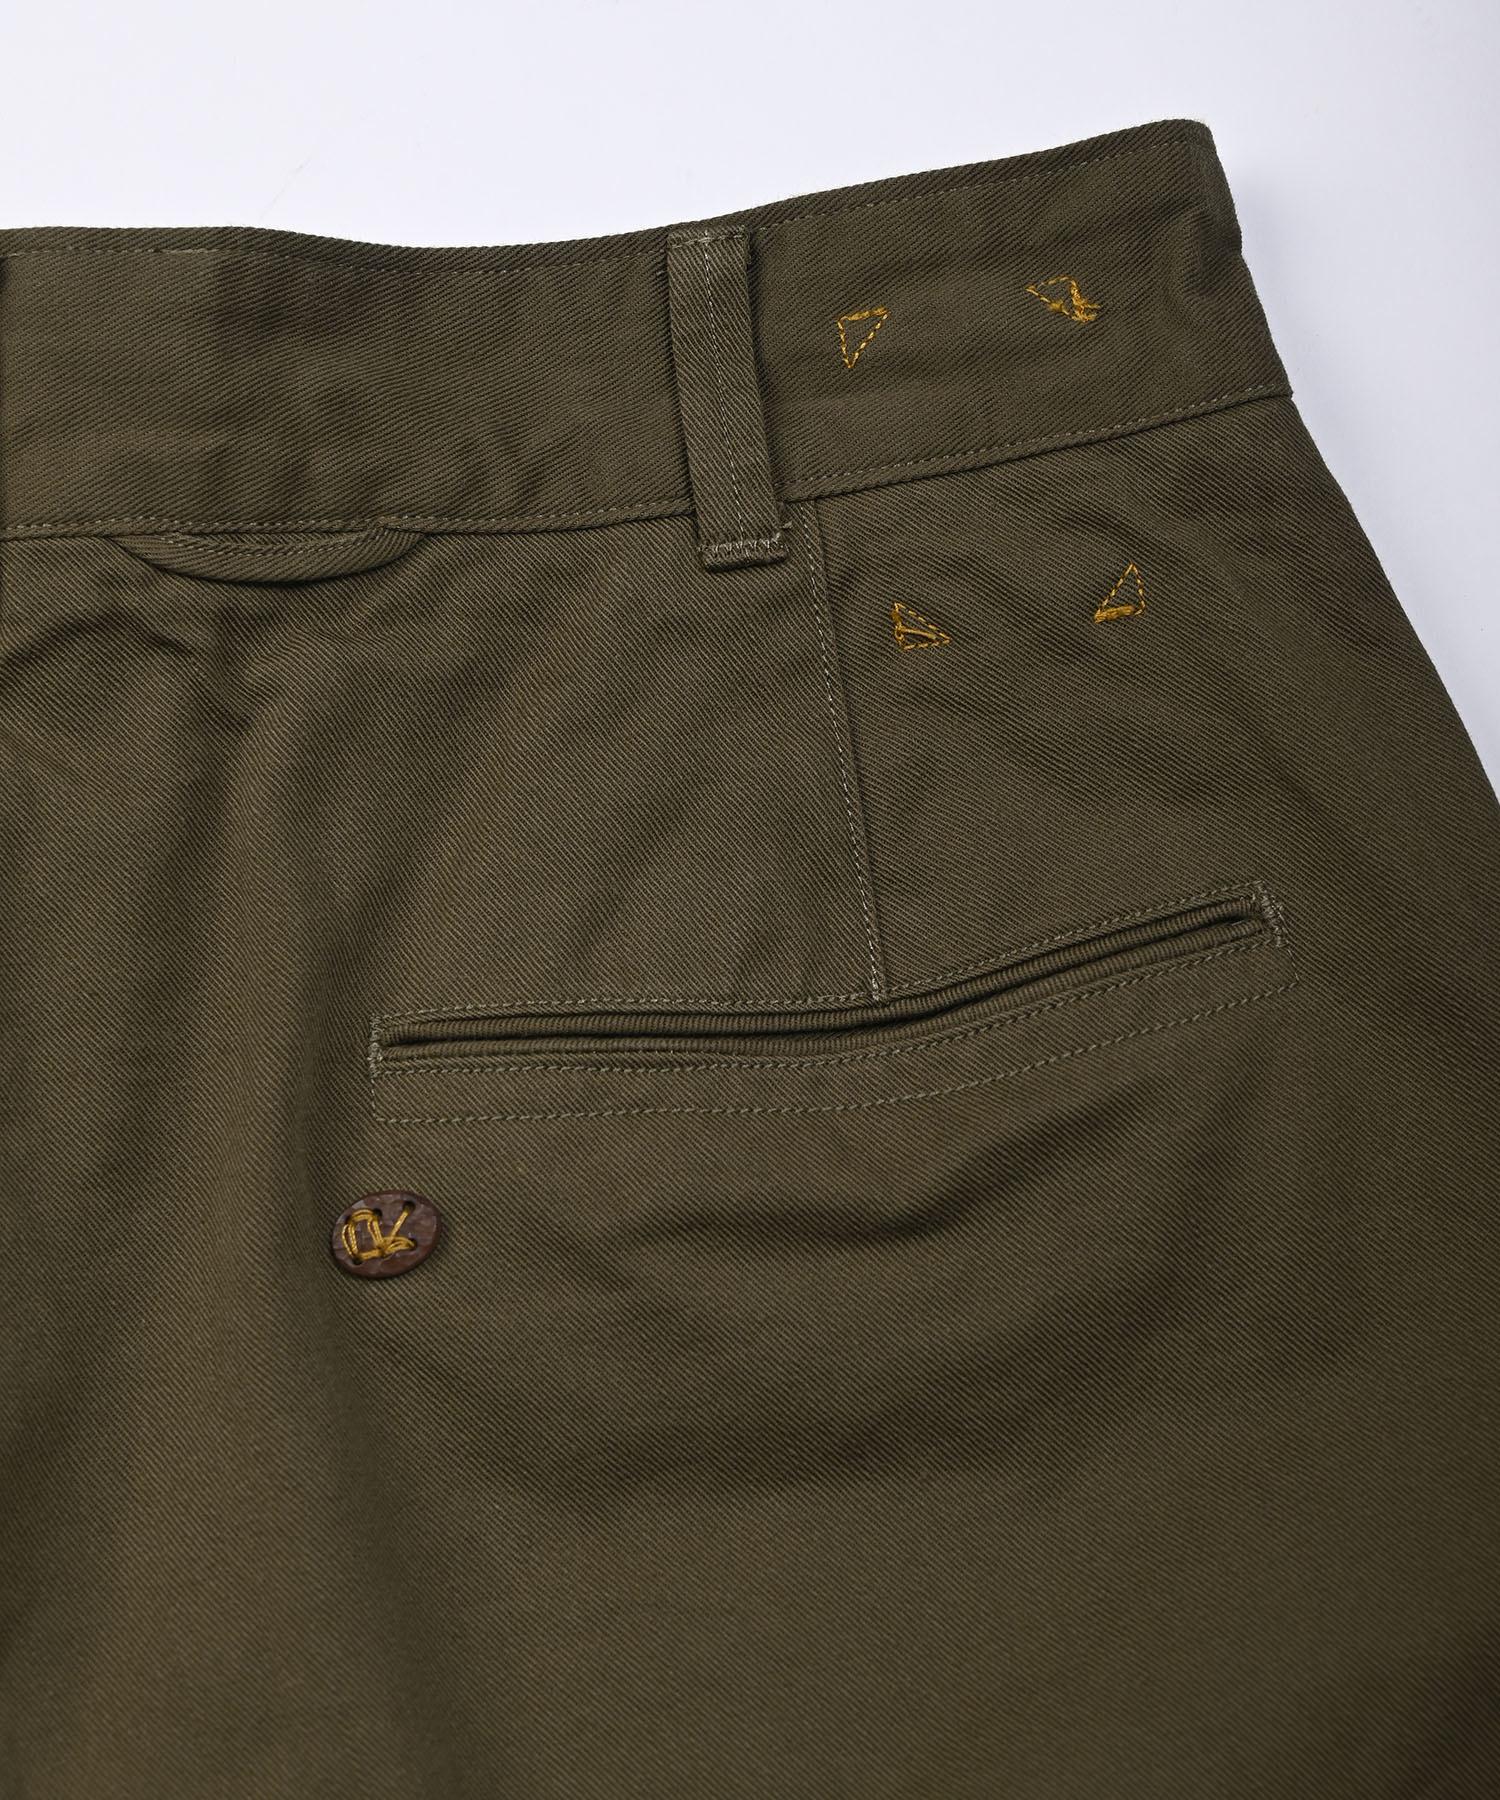 Okome Chino 908 Pants (0421)-6